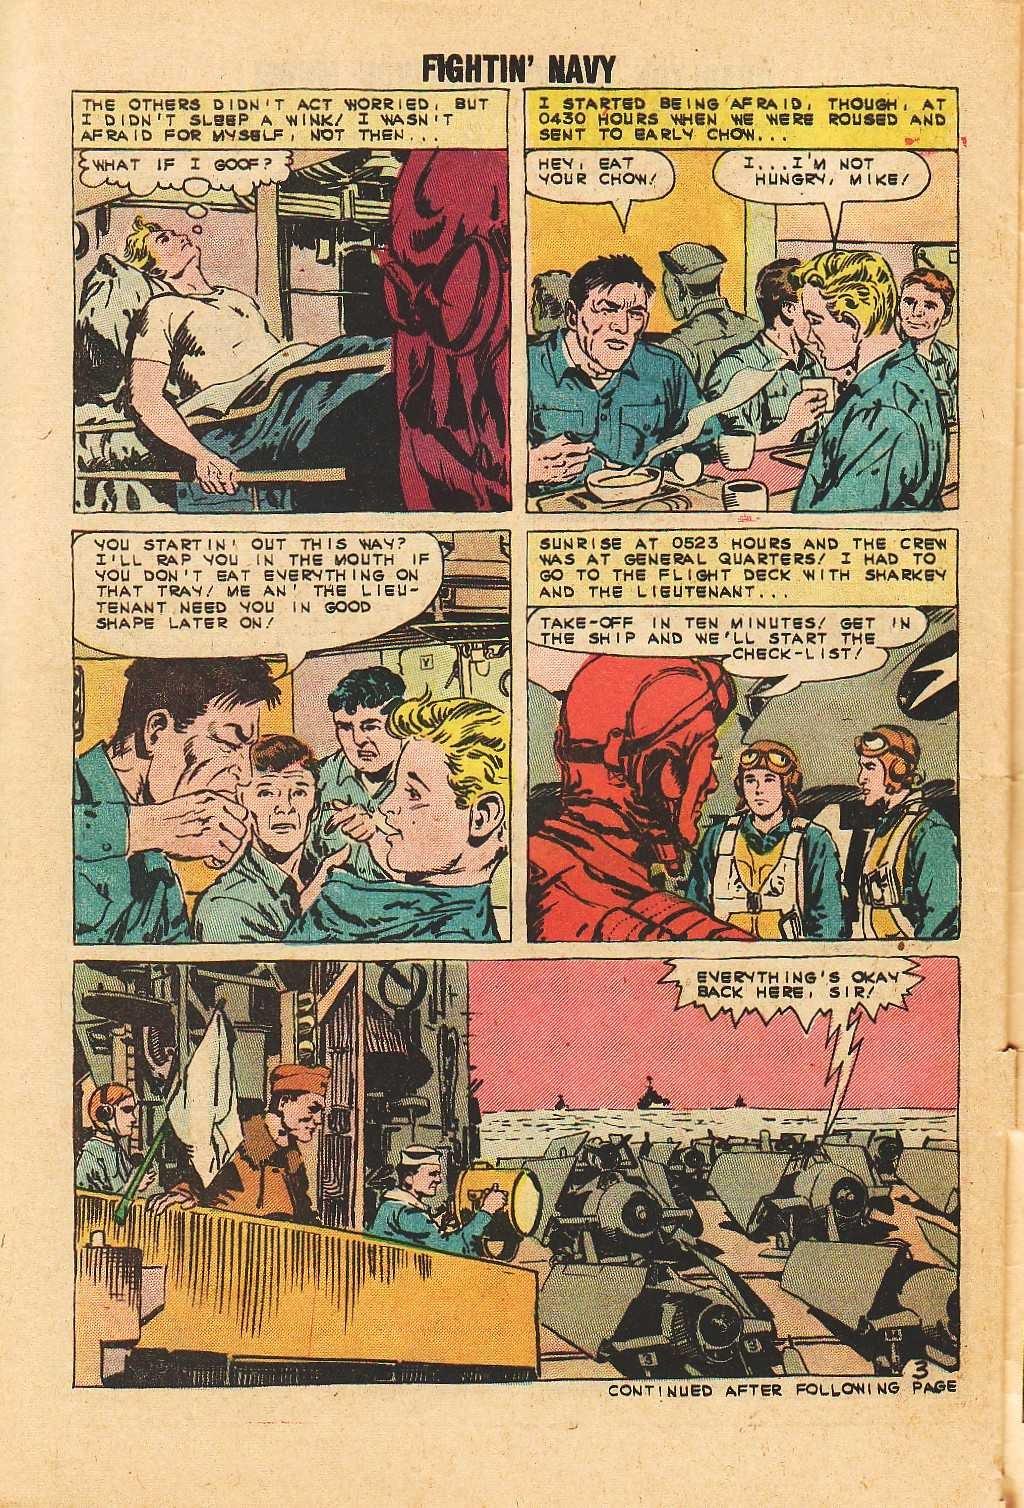 Read online Fightin' Navy comic -  Issue #113 - 30